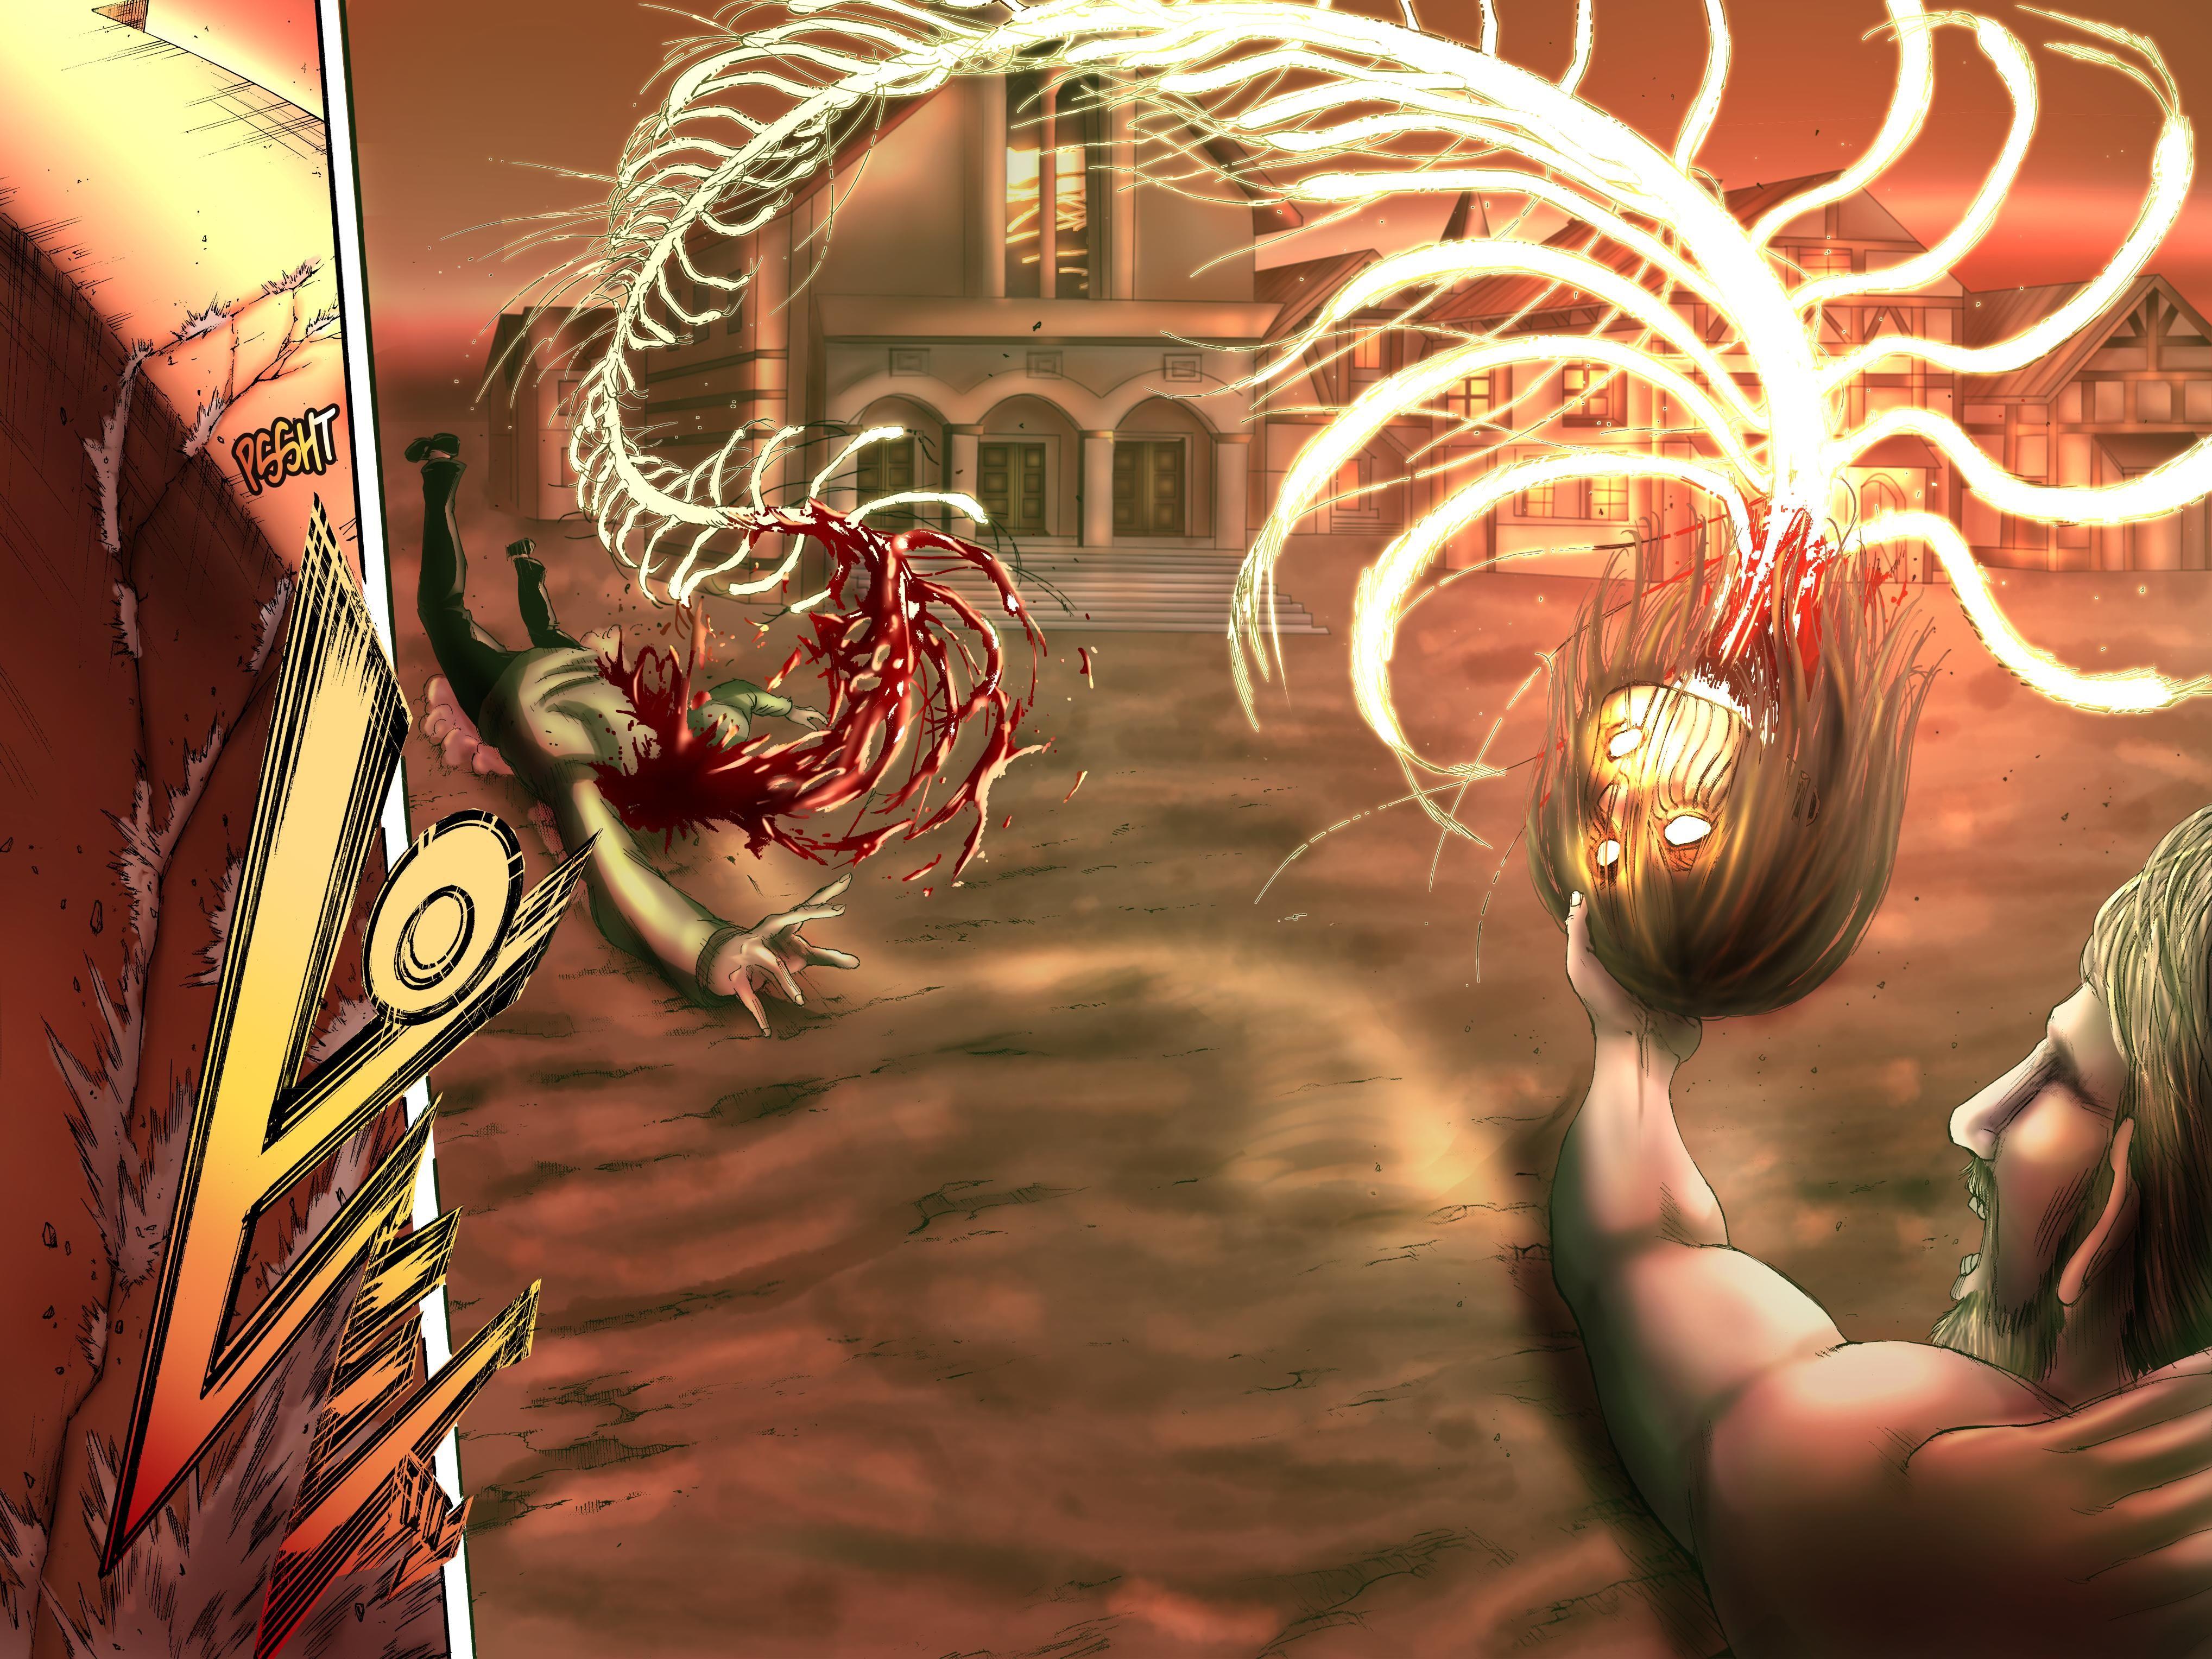 Shingeki No Kyojin Colored Chapter 122 Attack On Titan Anime Attack On Titan Fanart Attack On Titan Art